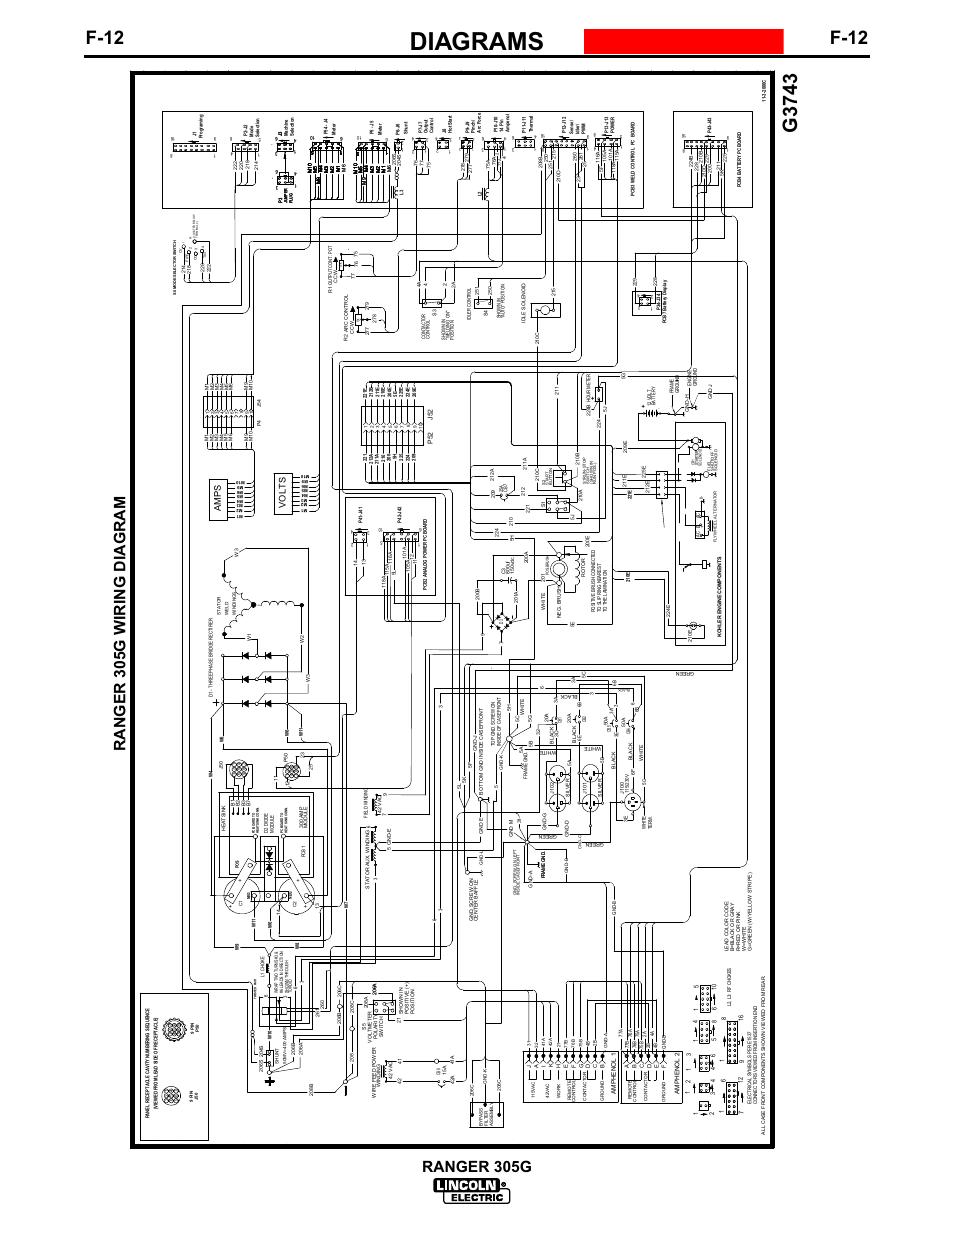 lincoln ranger 305d wiring diagram